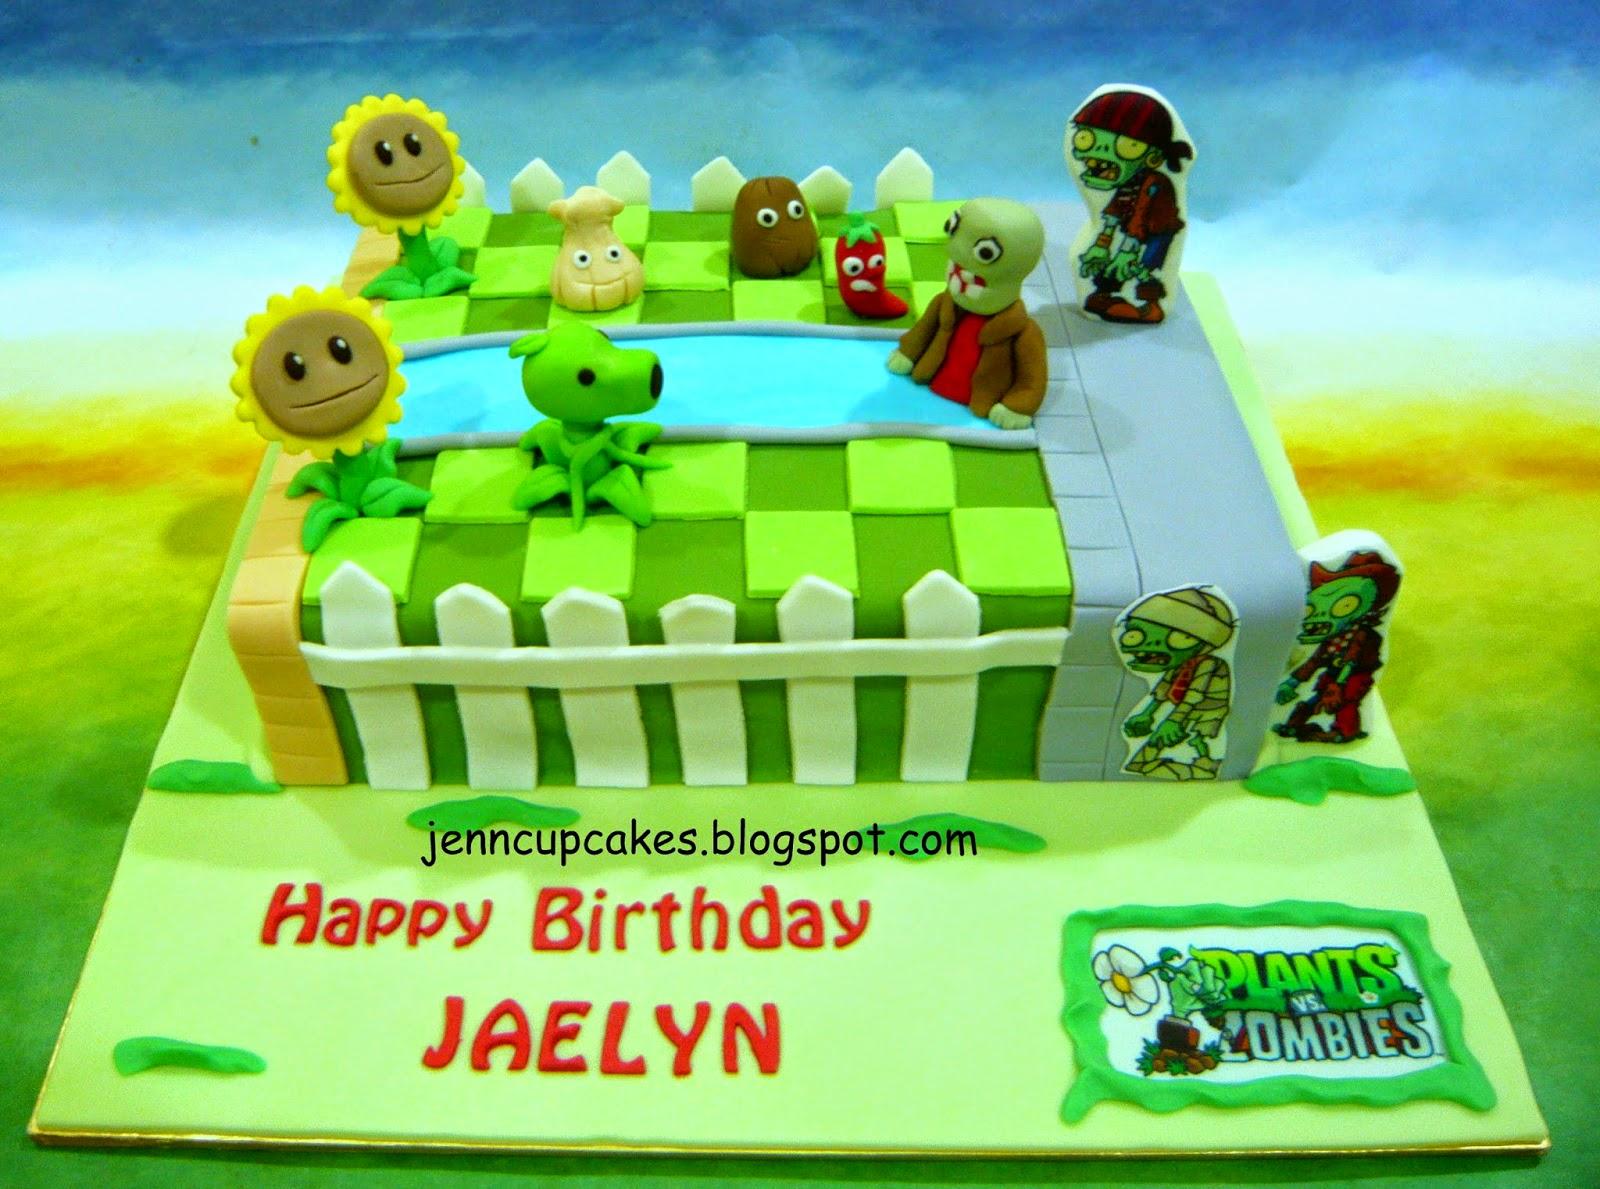 Jenn Cupcakes Muffins Plants Vs Zombies Cake